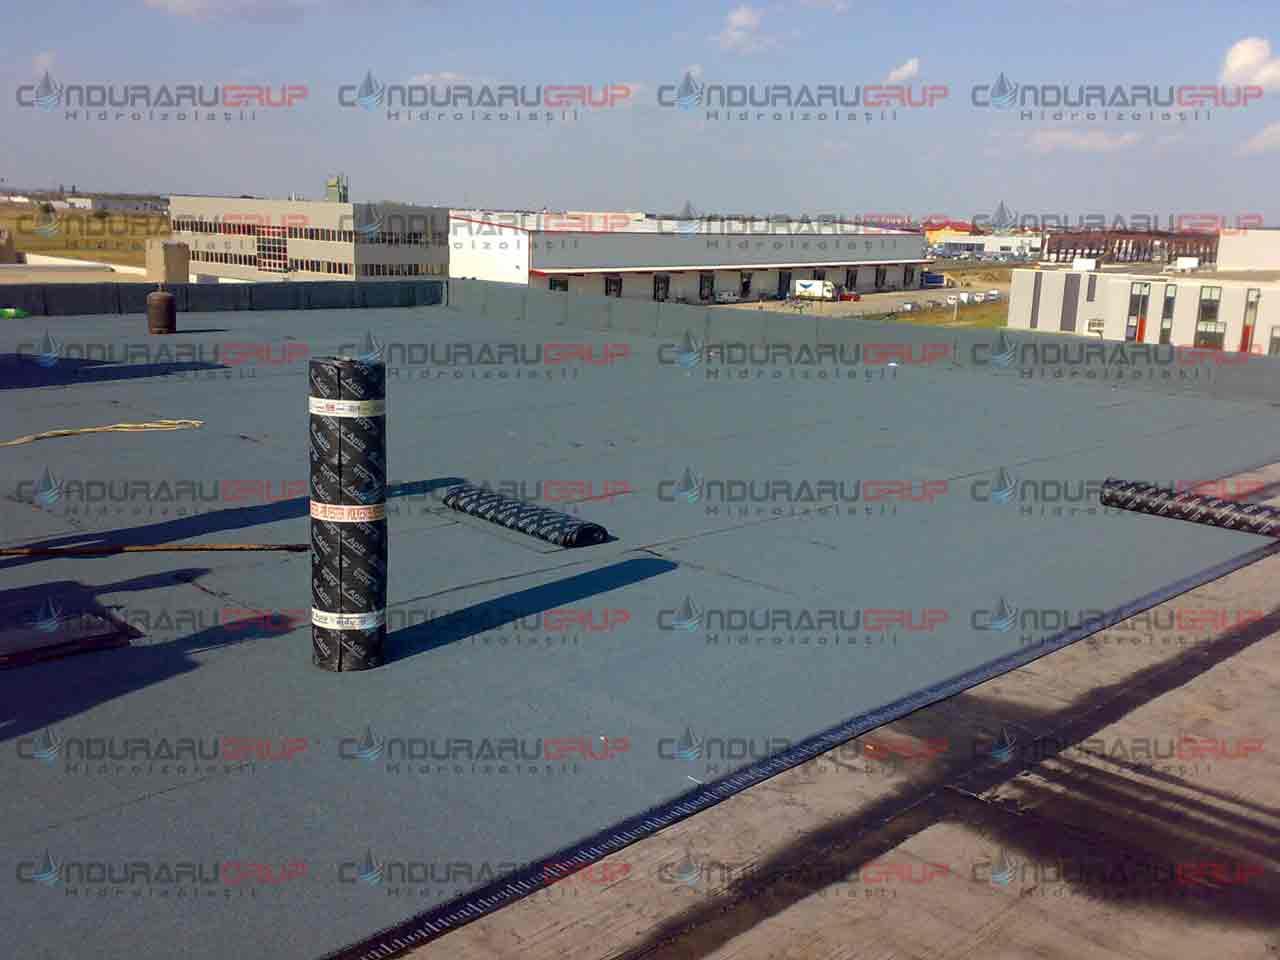 Sediu birouri si productie Soprex CONDURARU GRUP - Poza 10